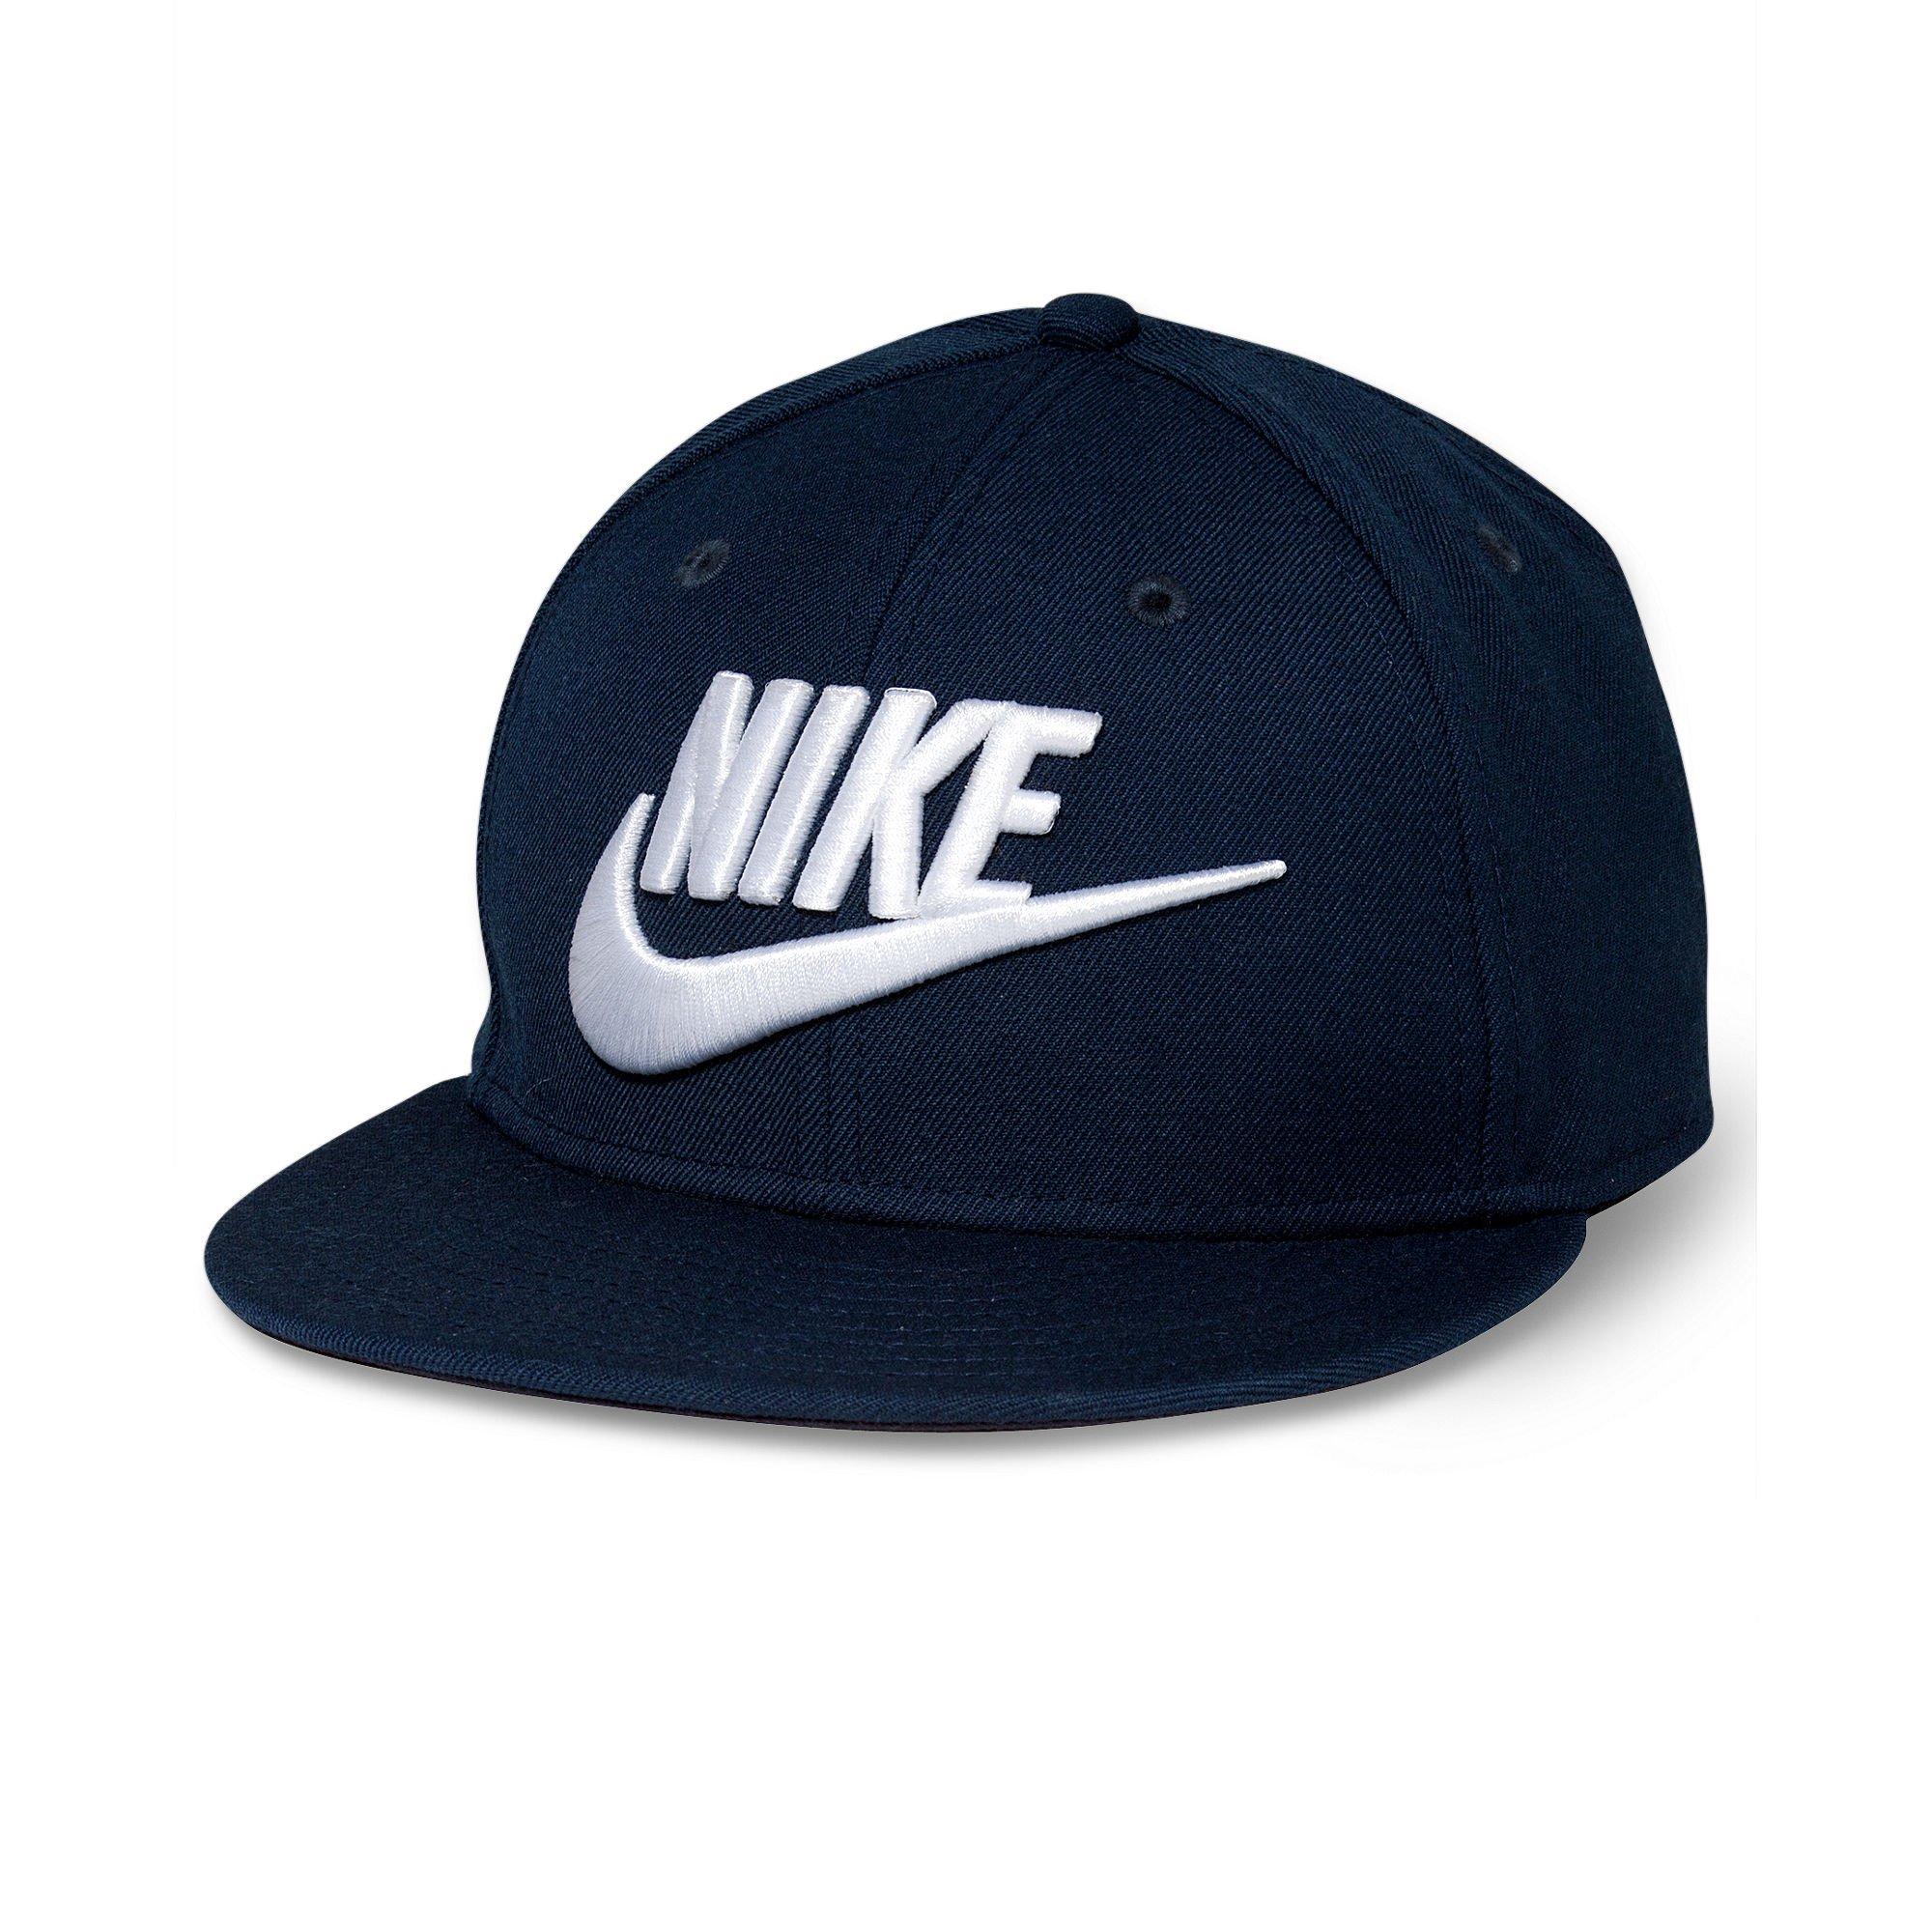 ... where can i buy lyst nike futura true snapback cap in black for men  e62d4 08021 df1d951f9b0